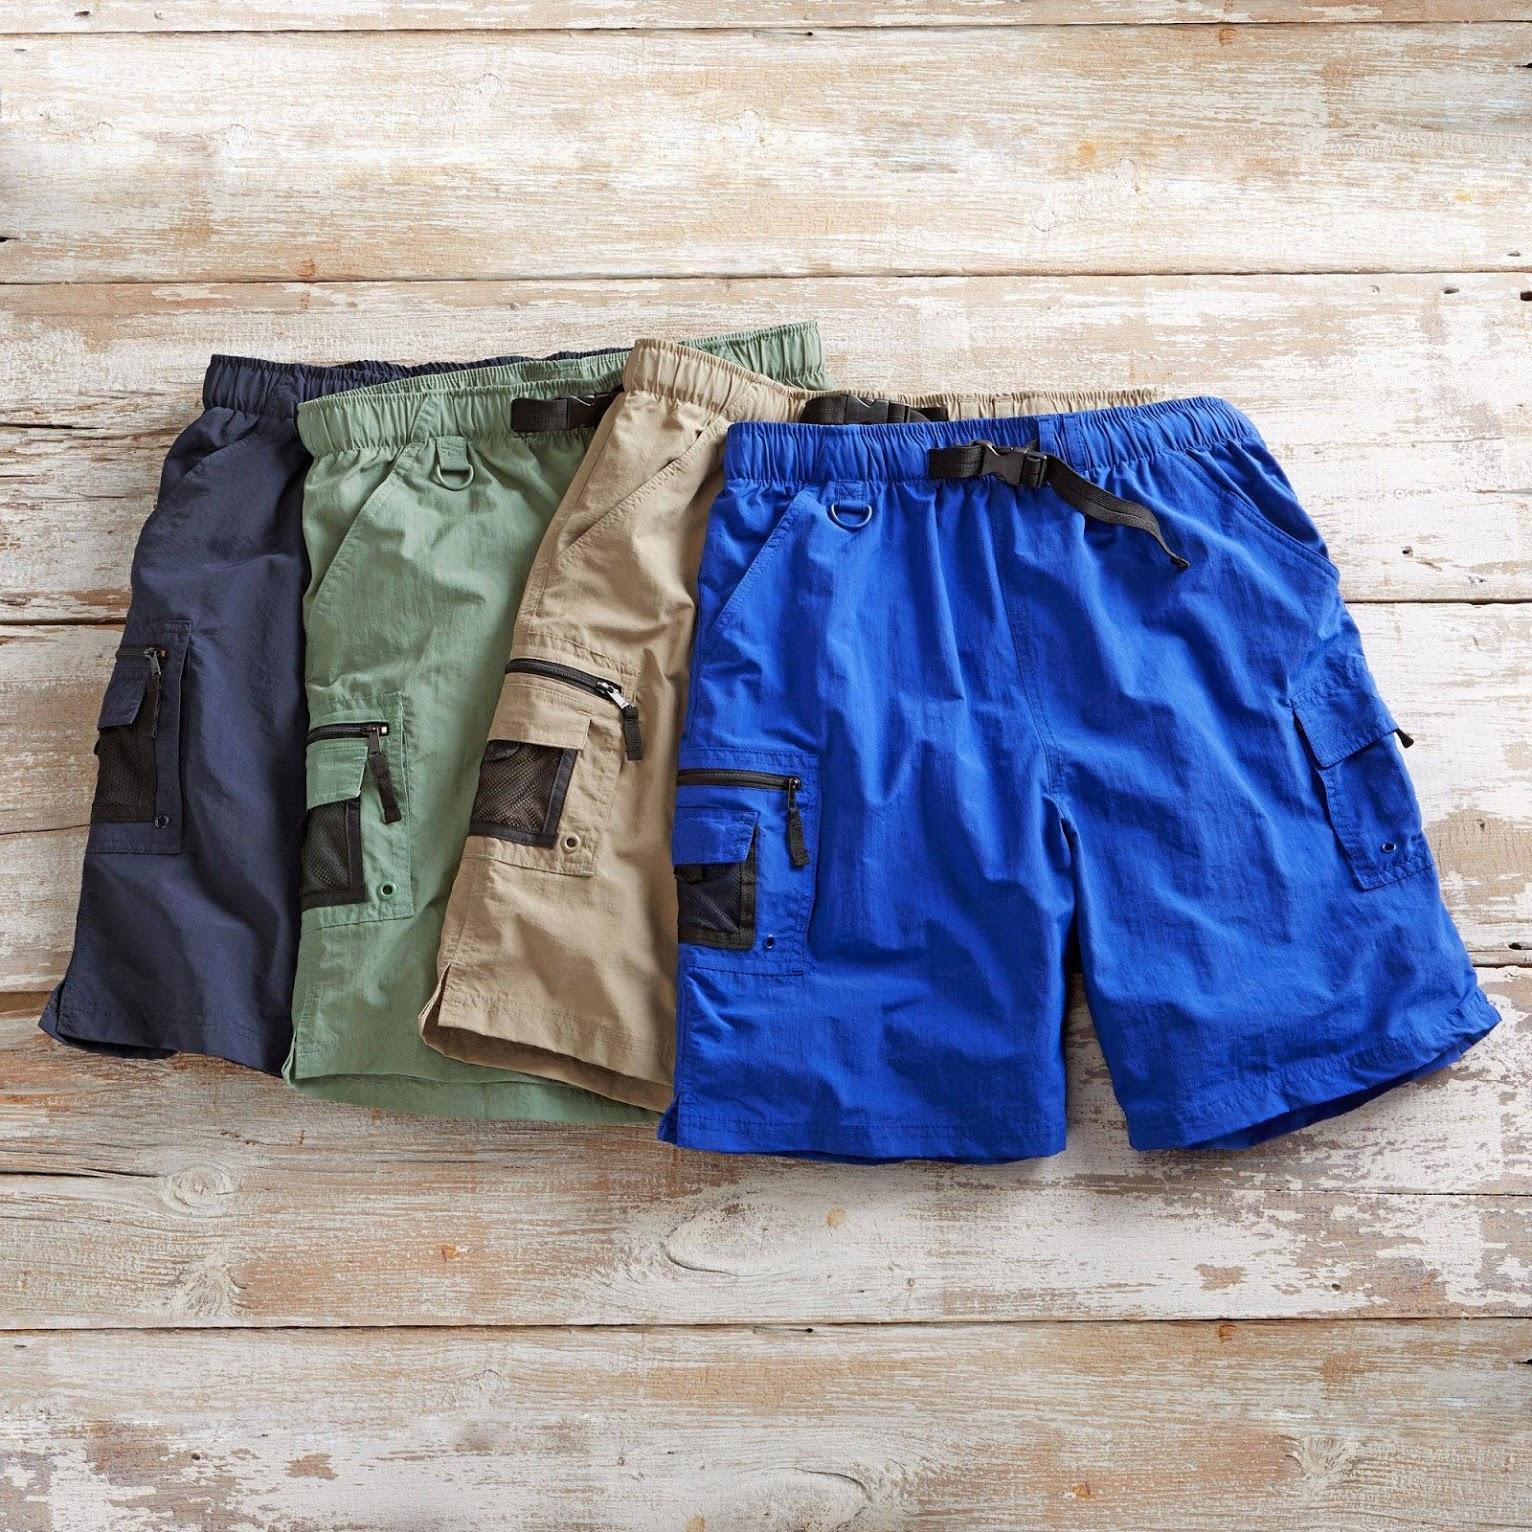 https://www.novica.com/p/quick-dry-adventure-water-shorts-adventure/358591/